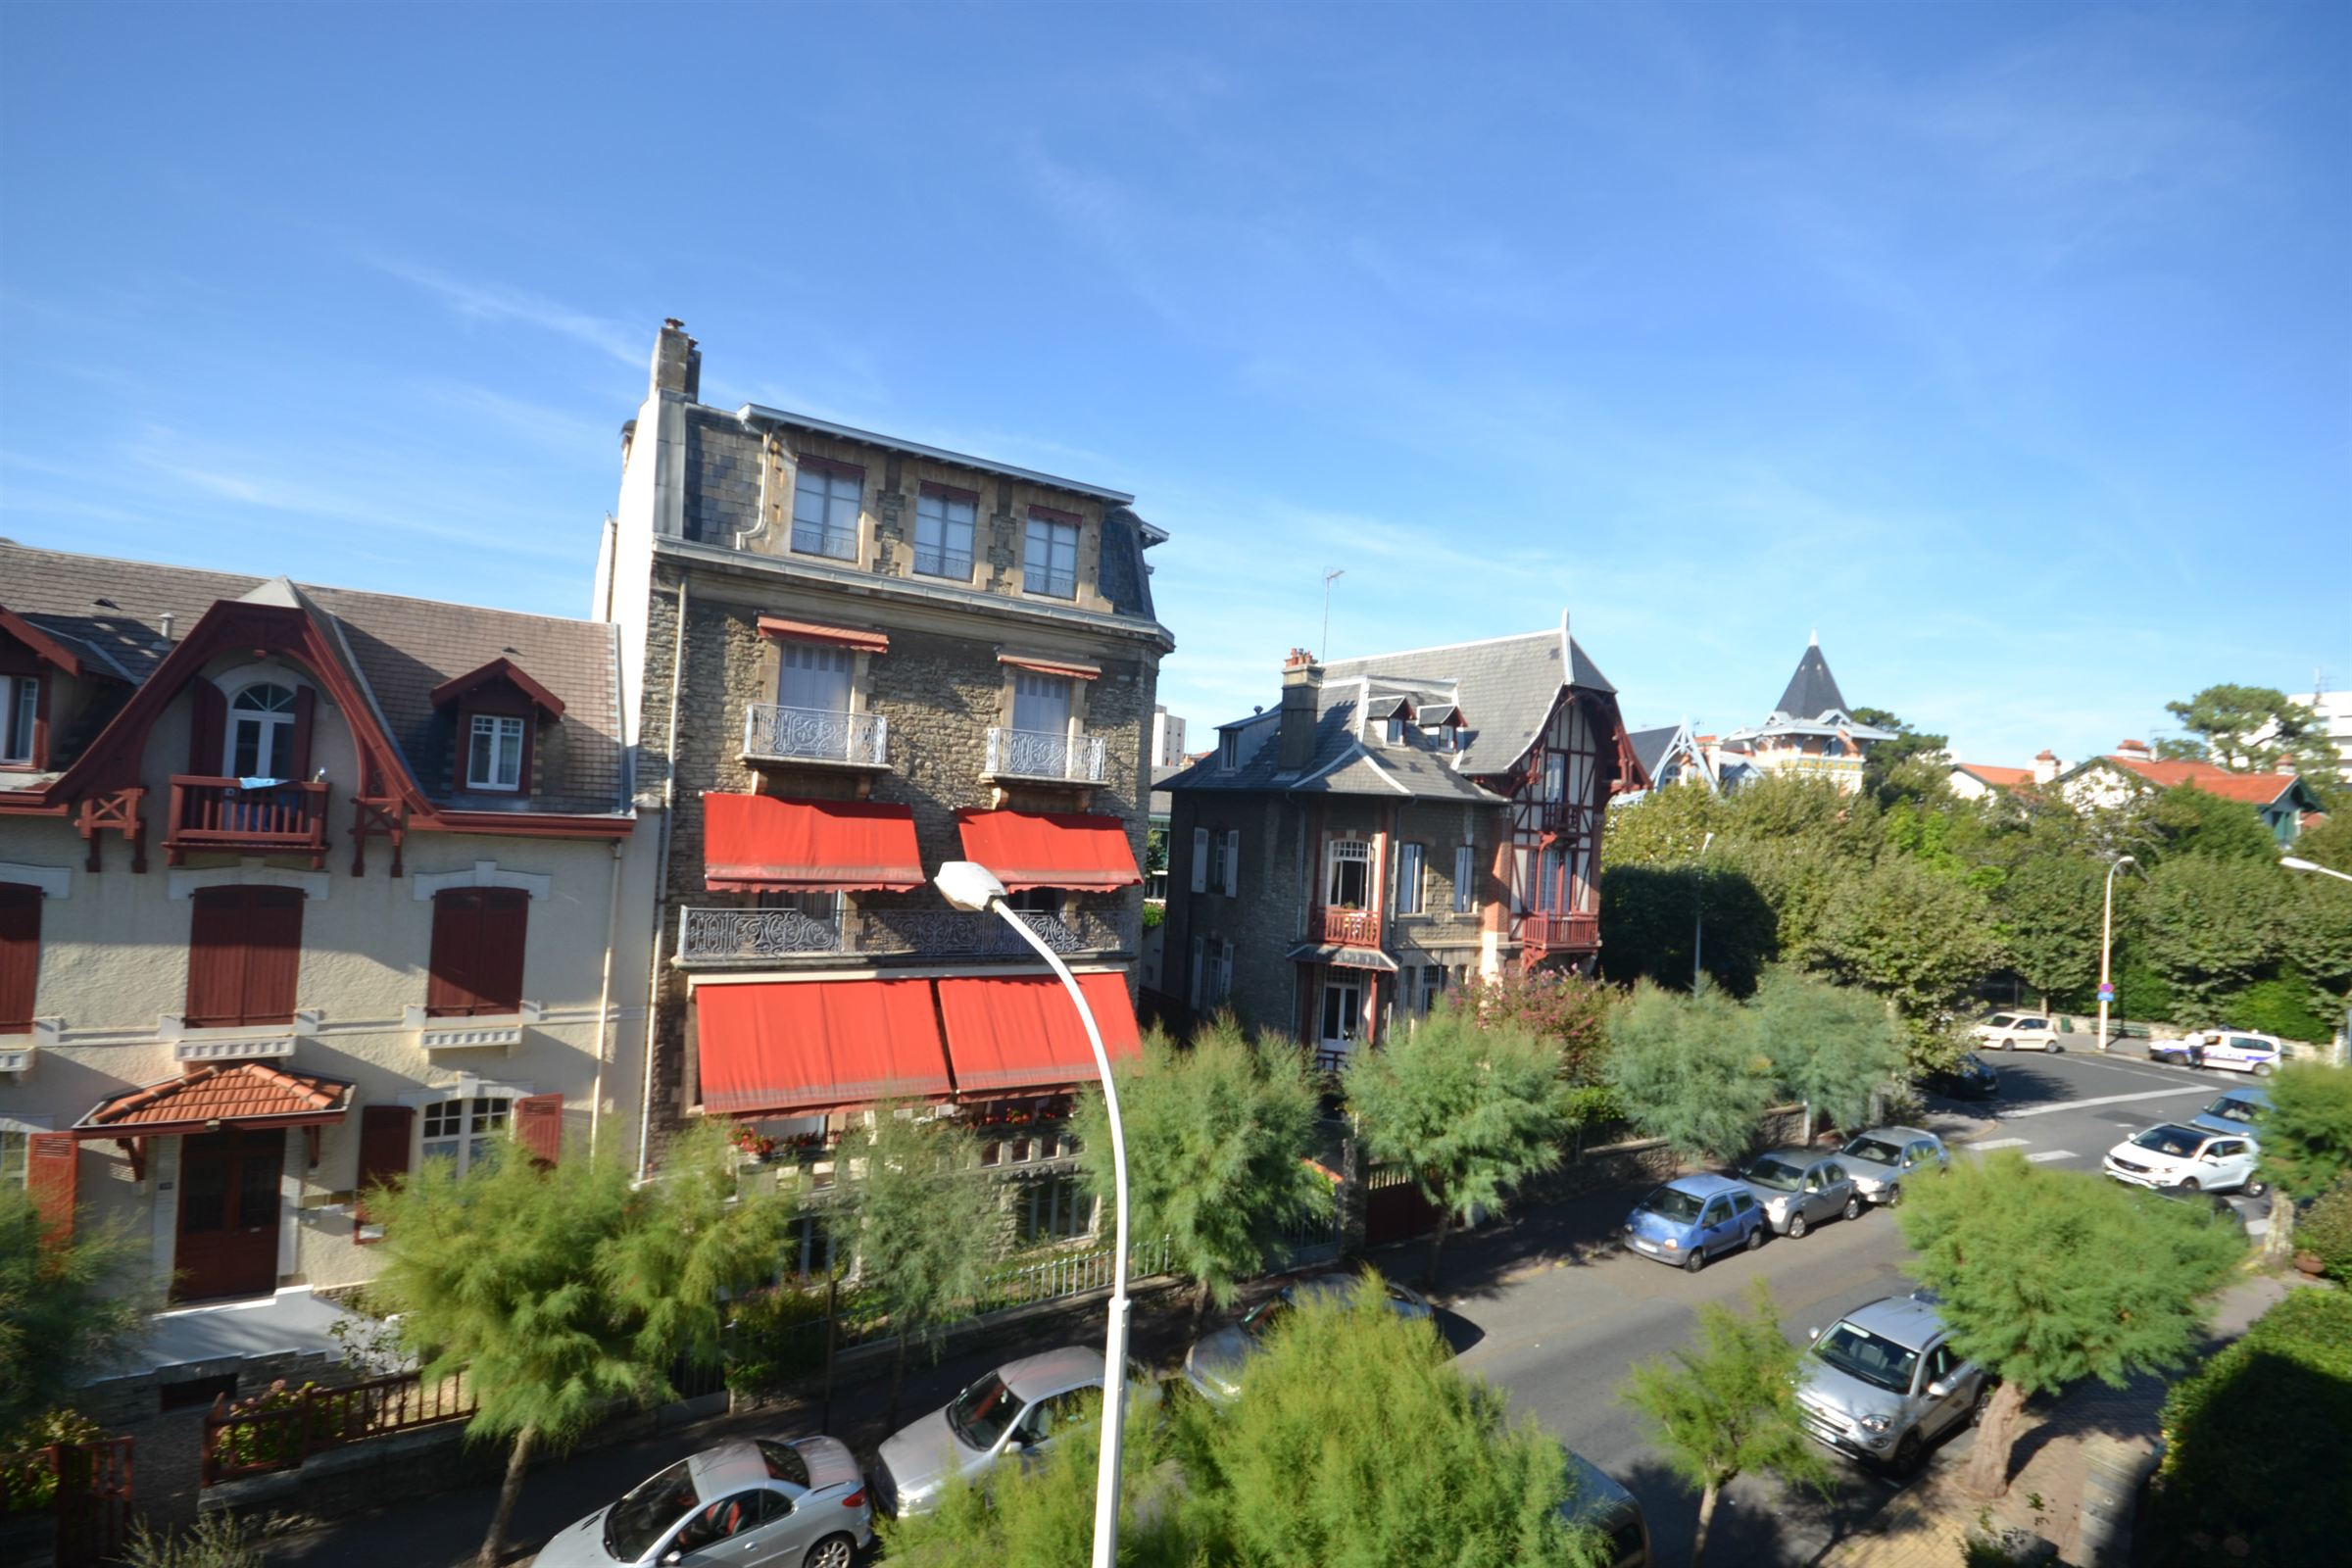 Apartment for Sale at BIARRITE SAINT CHARLES Biarritz, Aquitaine, 64200 France